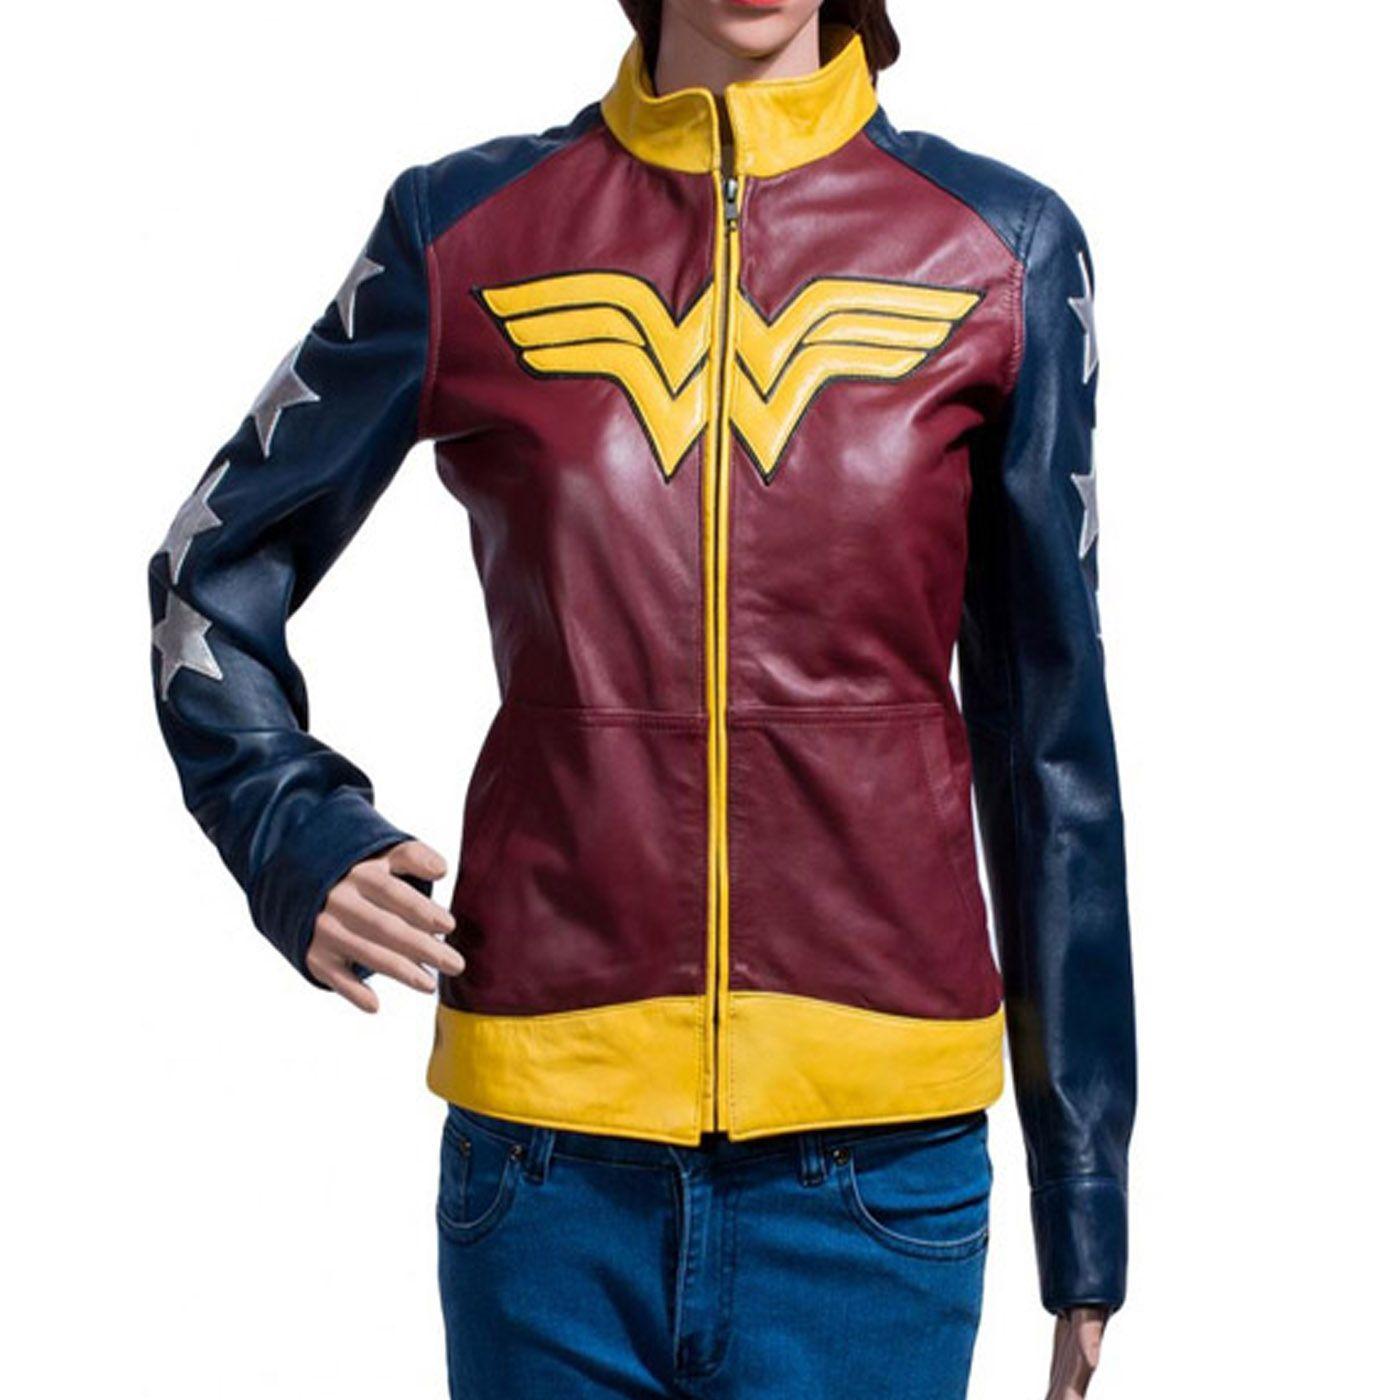 Wonder Woman Leather Jacket Jackets for women